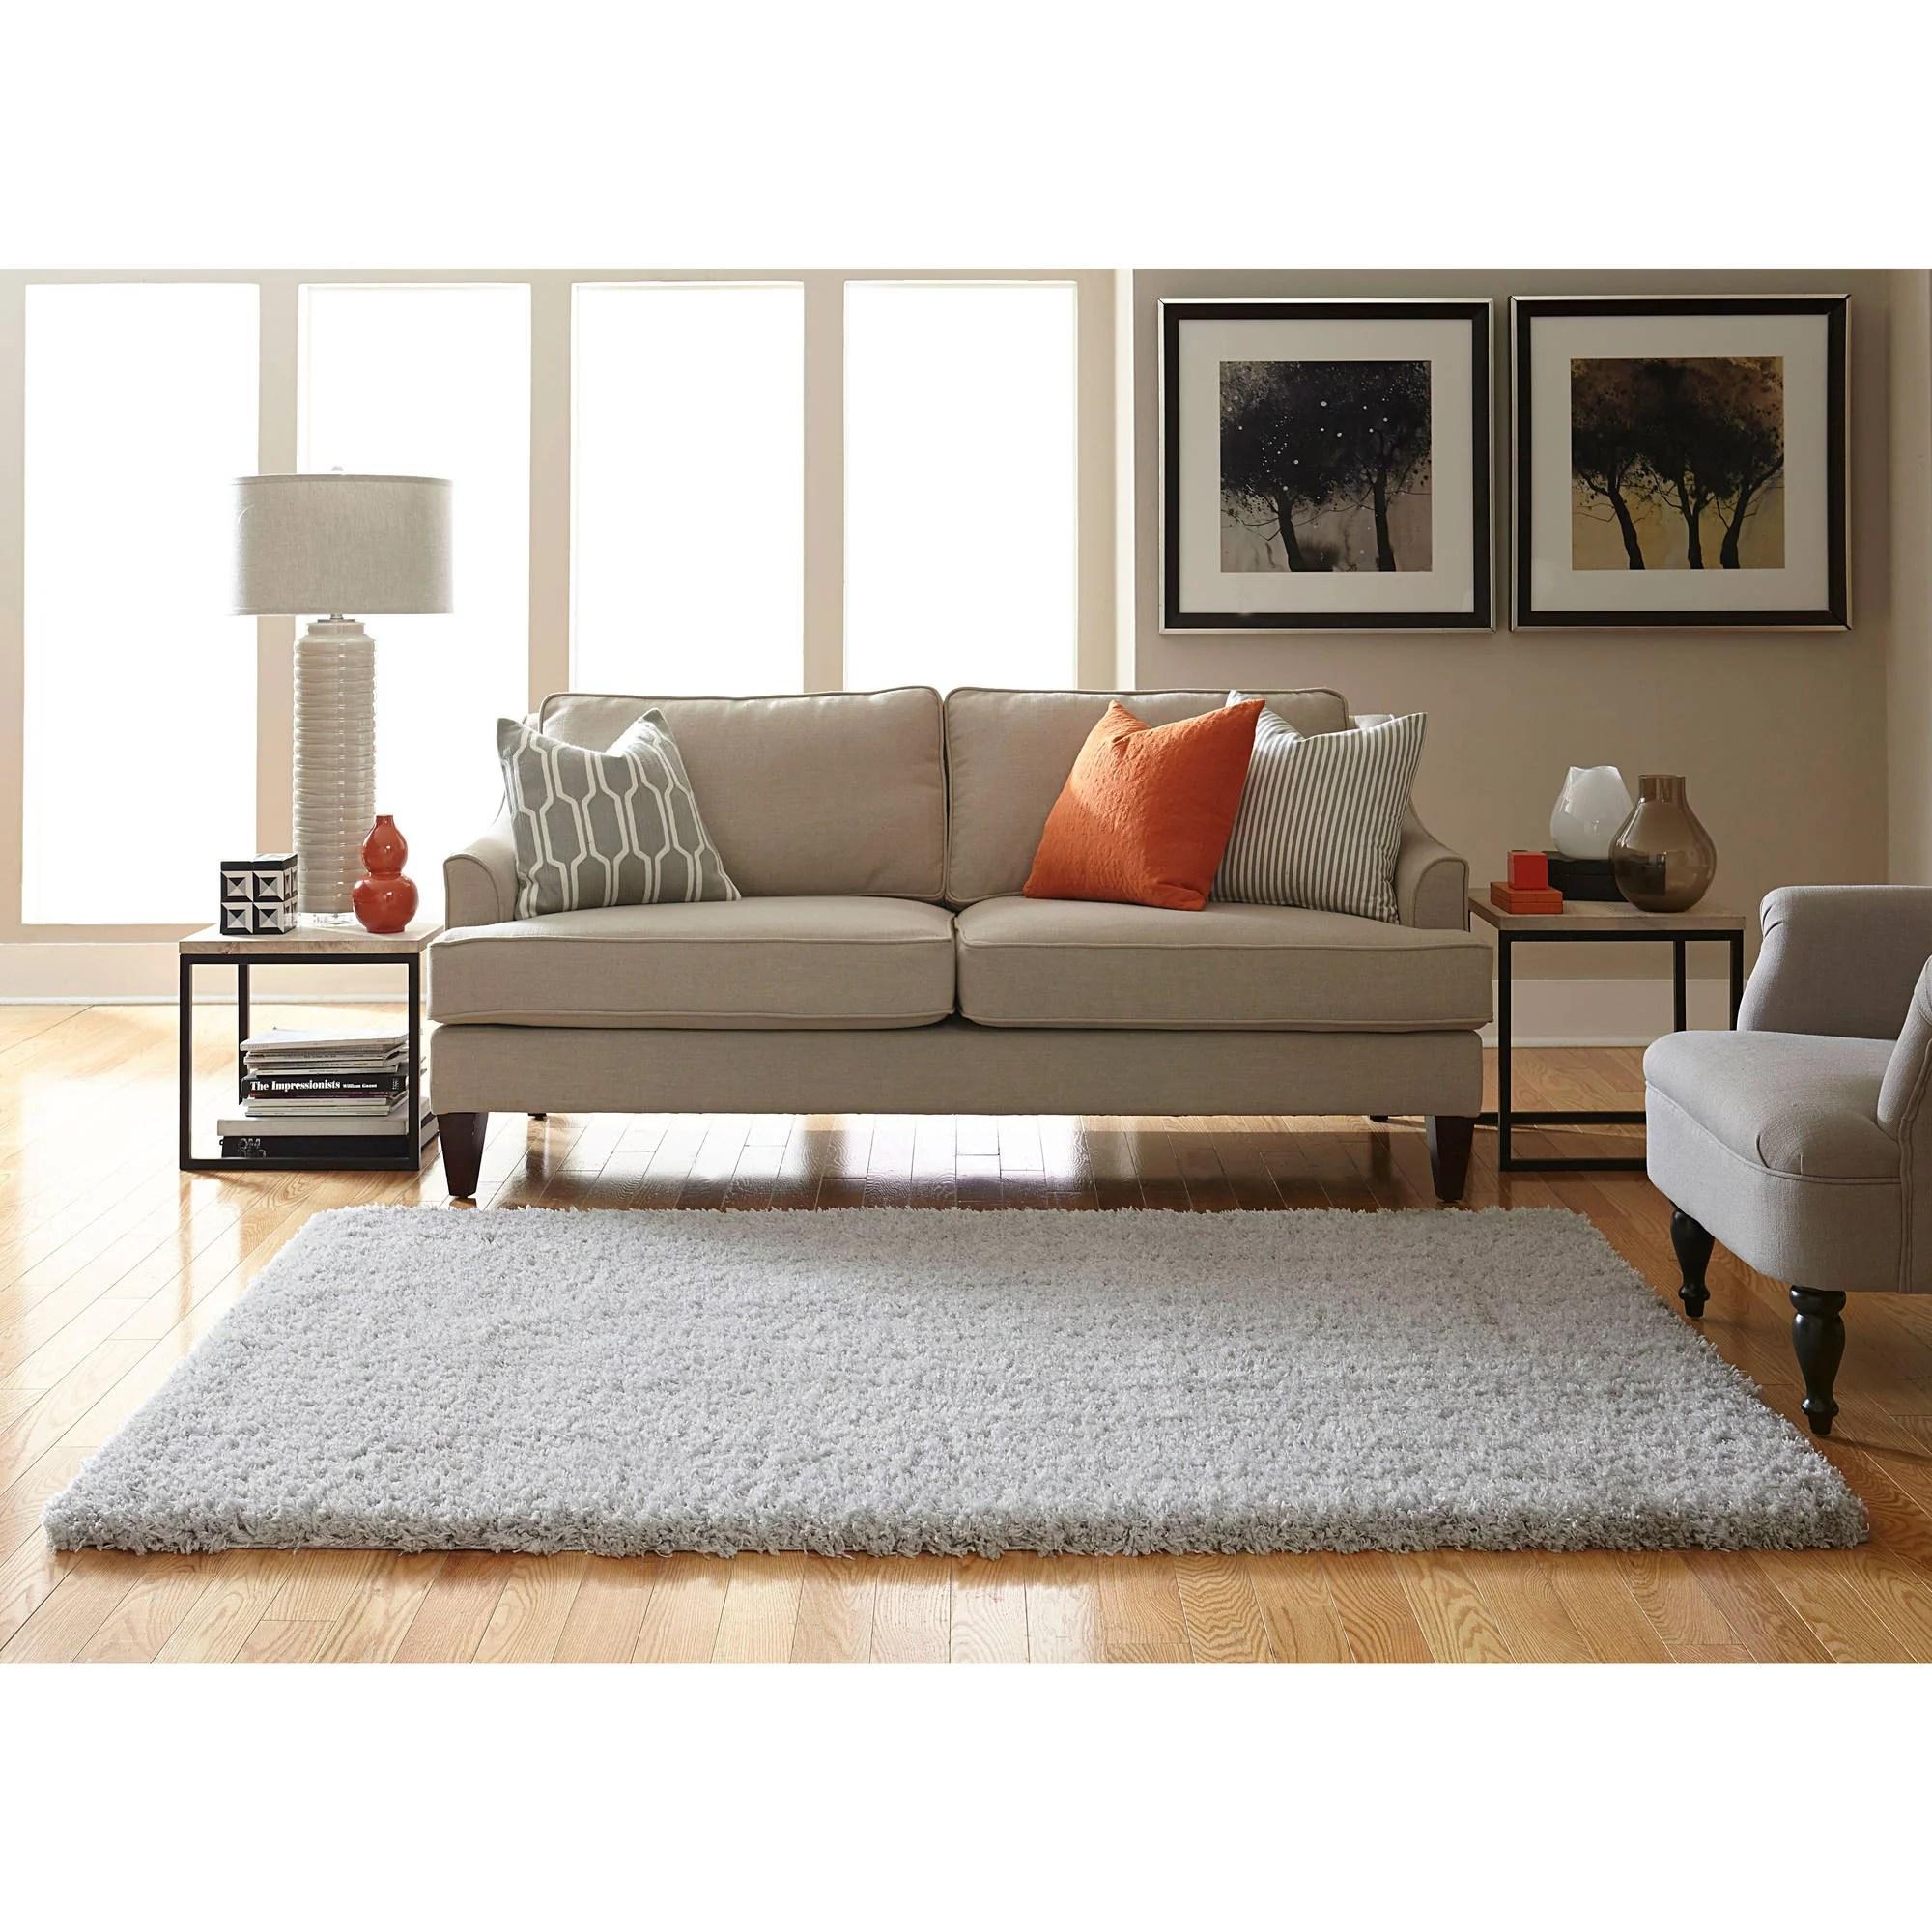 walmart rugs for living room single chairs india plush teddy shag rug com